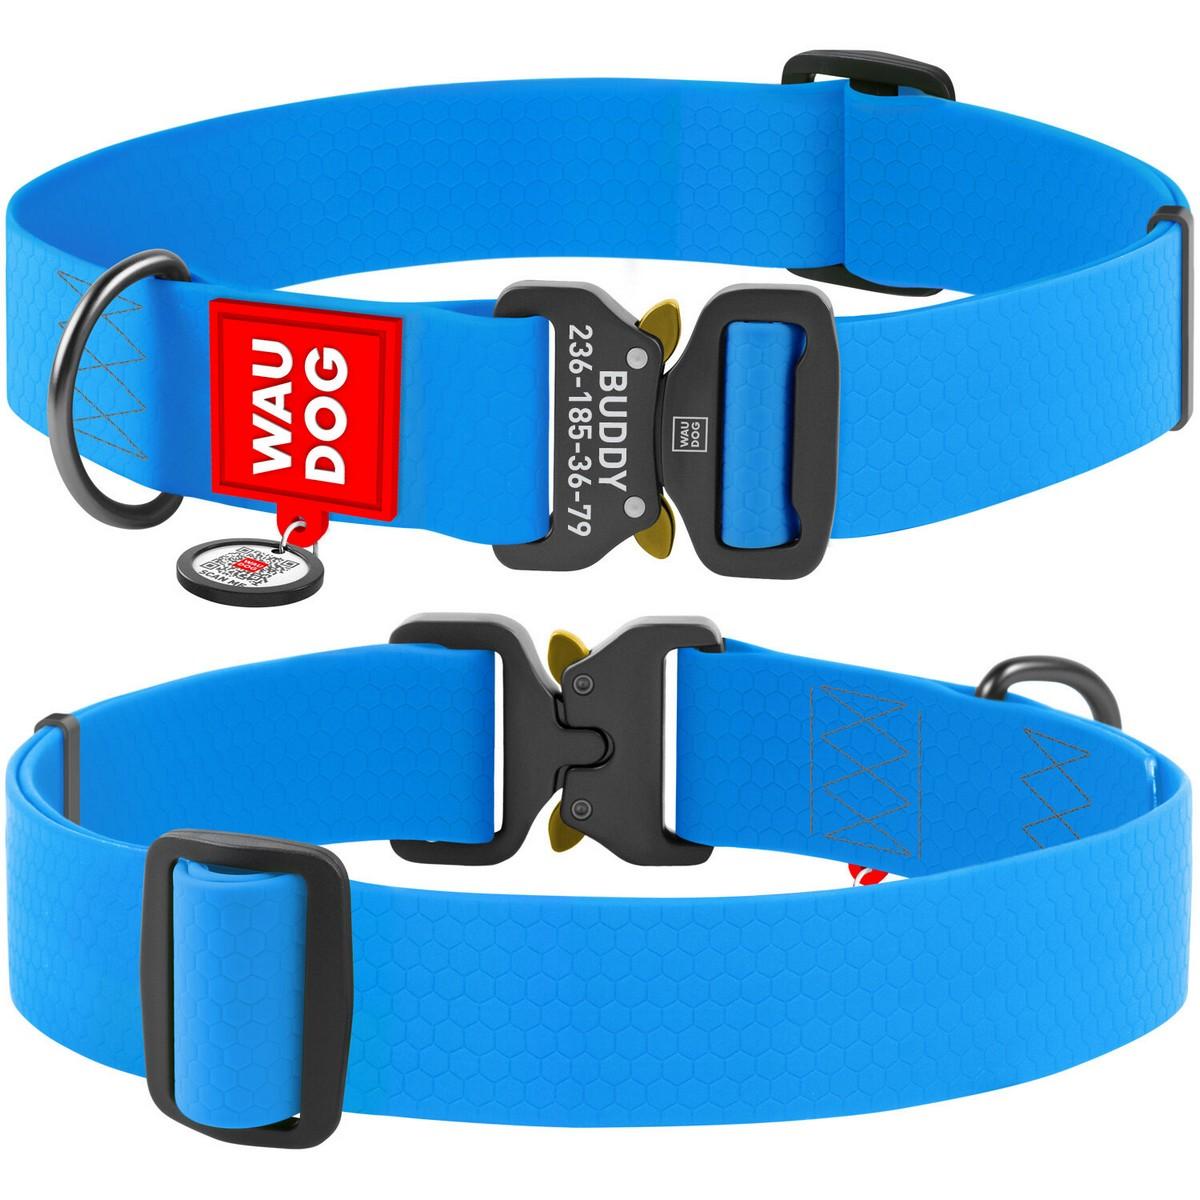 Нашийник для собак водостійкий WAUDOG Waterproof c QR паспортом, металева пряжка-фастекс, блакитний XXL (ширина 40 мм, довжина 43-70см)